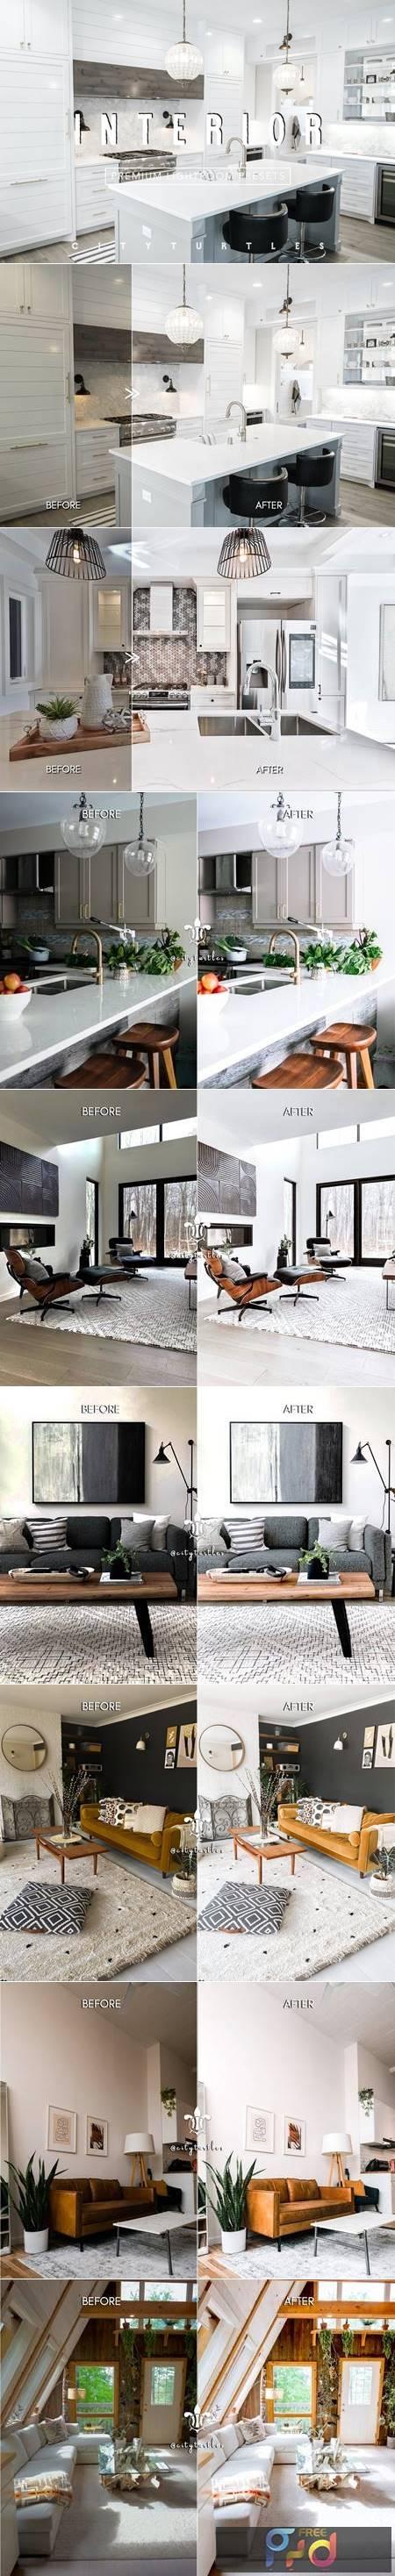 Bright Interior Desktop Presets 5033109 1